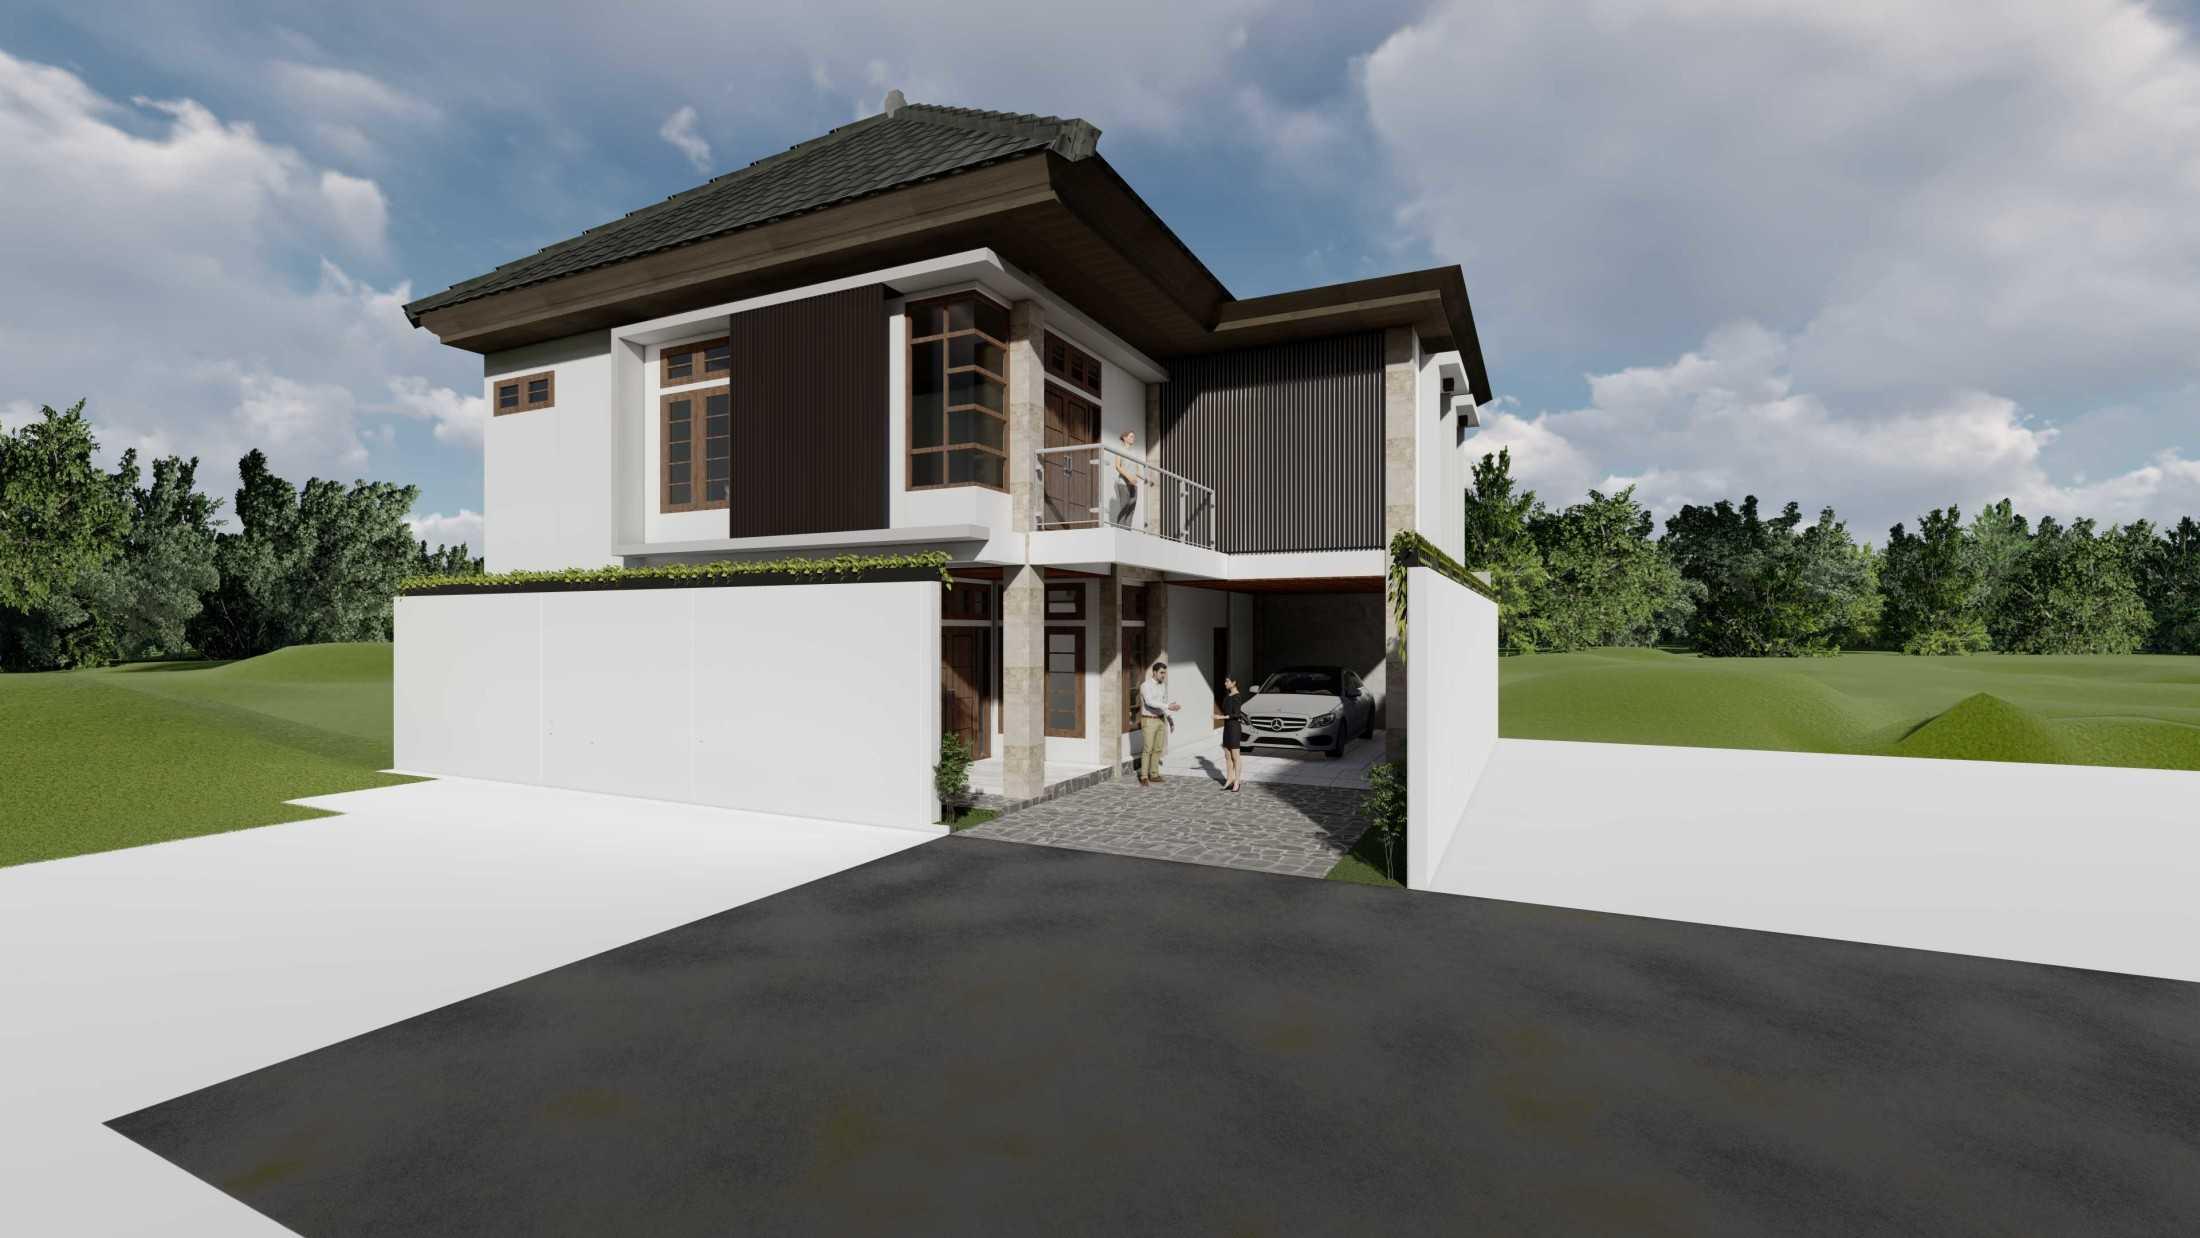 Astabumi Studio Js House Timor Leste Dili, Timor-Leste Pati, Kec. Pati, Kabupaten Pati, Jawa Tengah, Indonesia Cv-Astabumi-Manunggal-Prakarsa-Js-House-Timor-Leste  119258